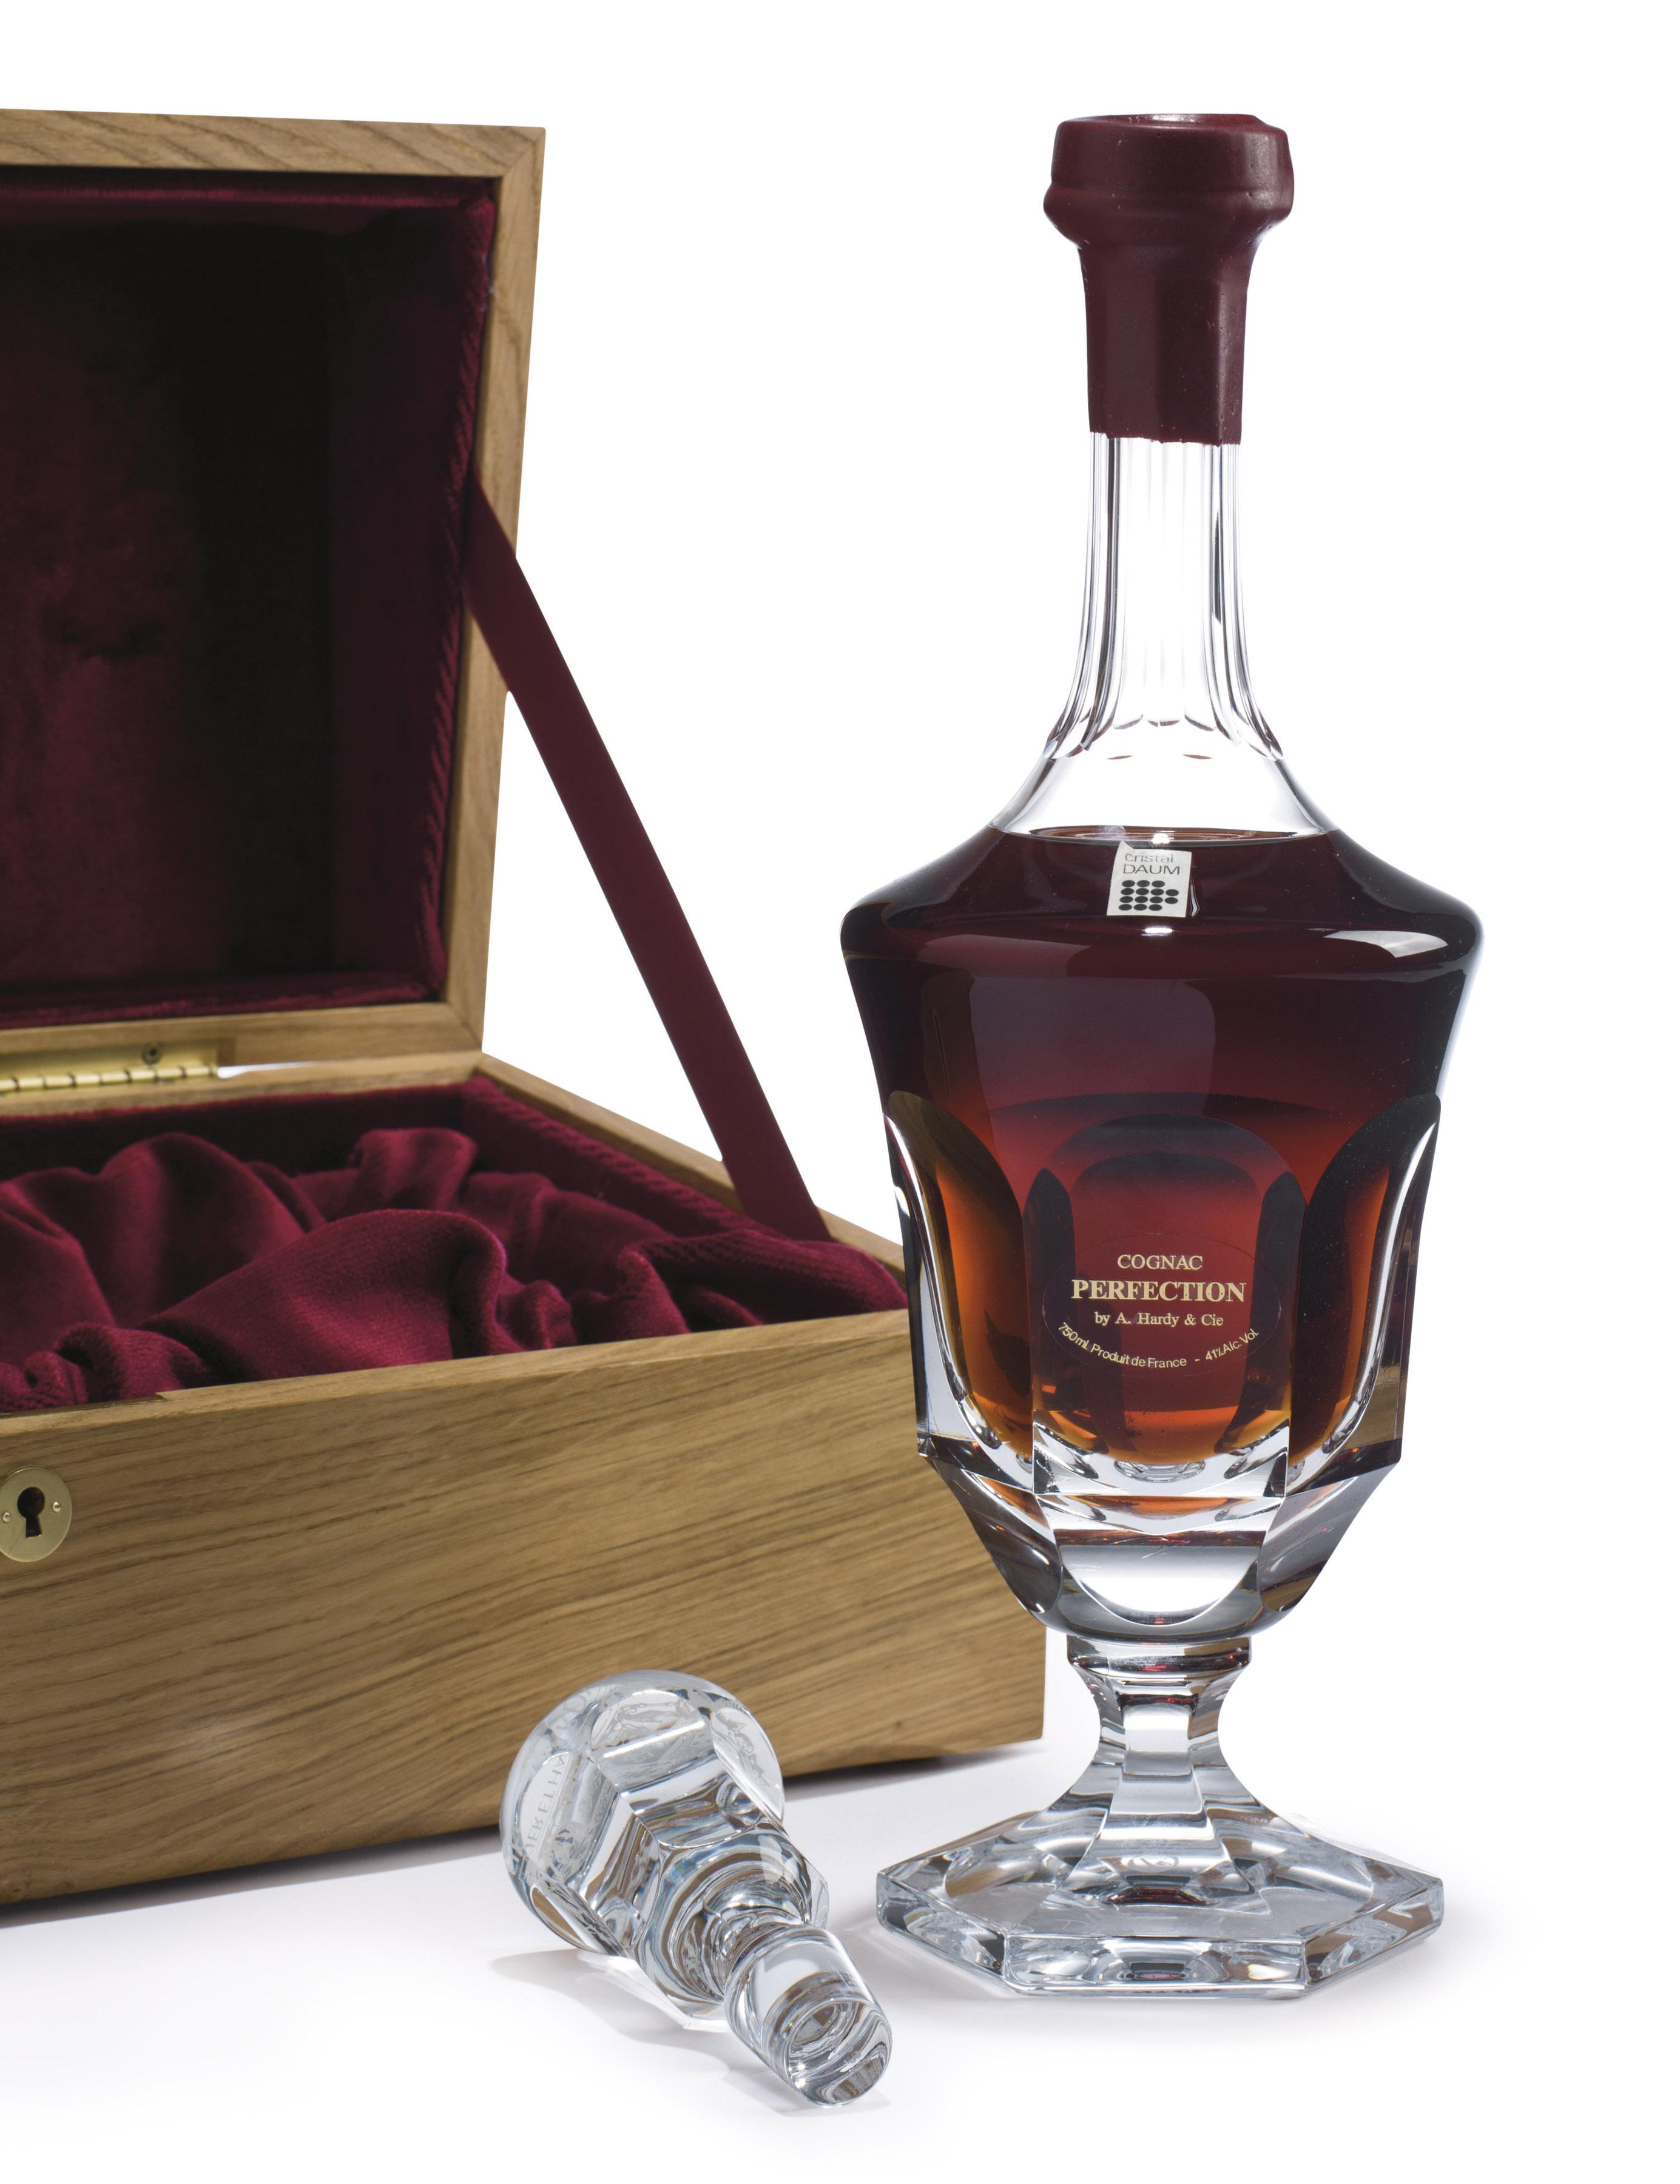 Hardy Perfection Cognac